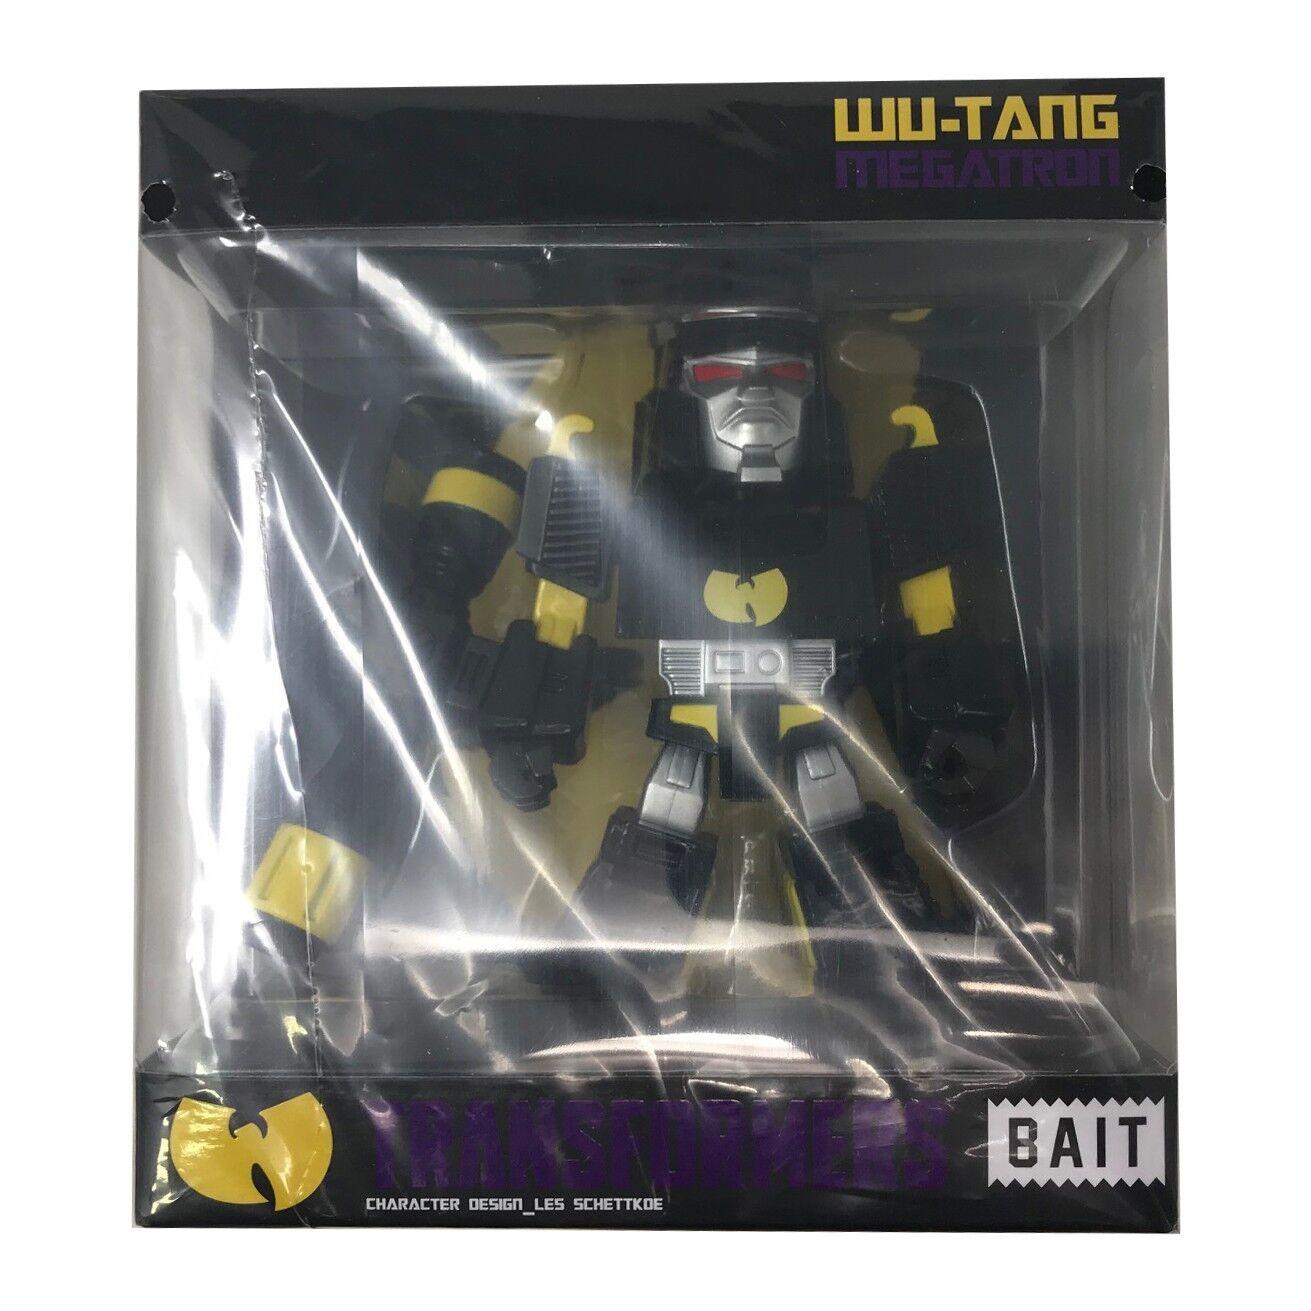 SDCC 2018 BAIT Wu-Tang Clan Transformers Megatron Figure Comic Con